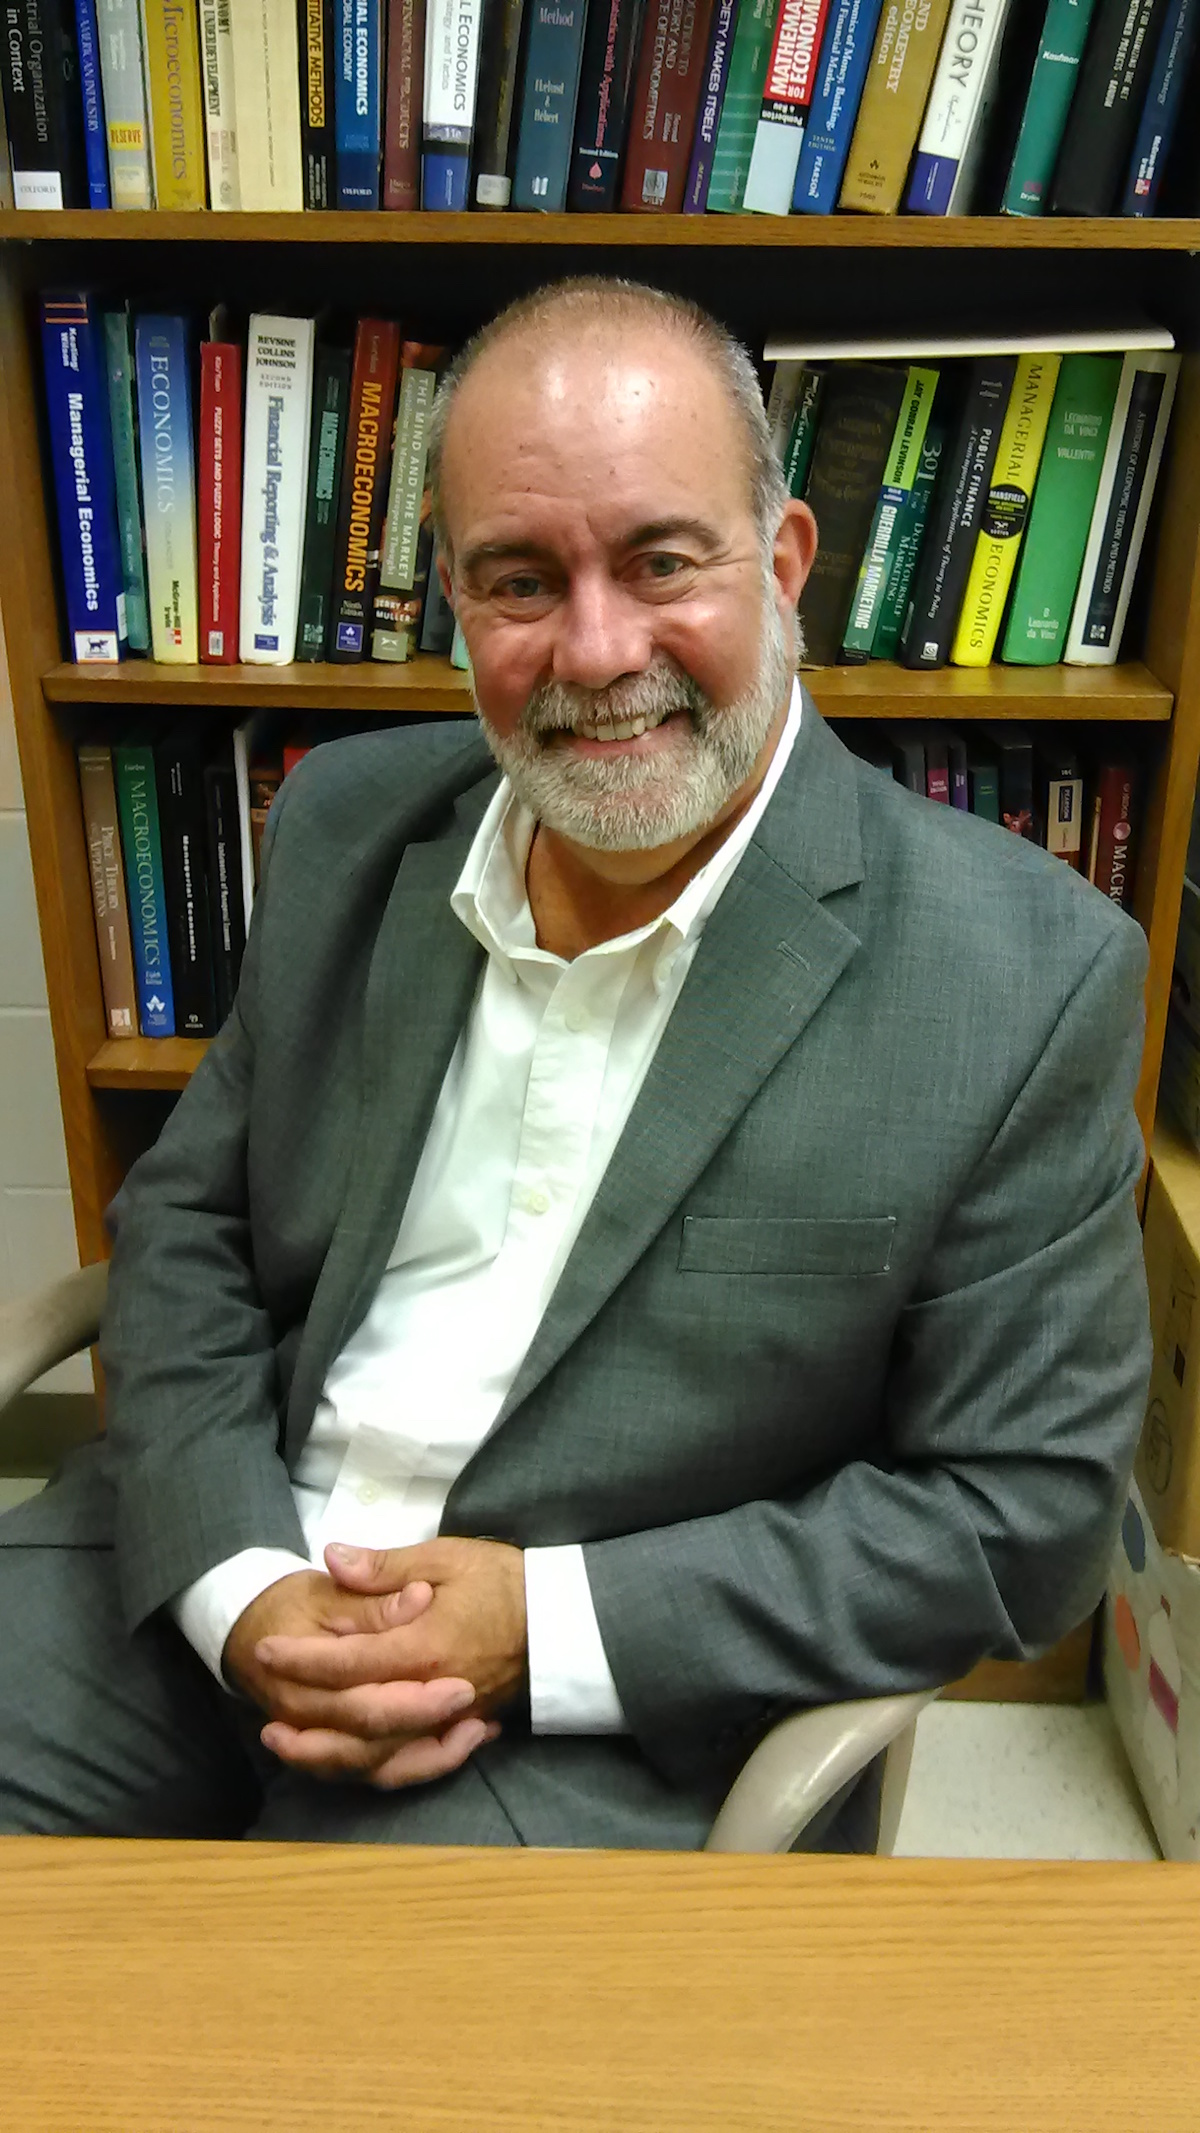 A La Porte County Life in the Spotlight: Anthony Sindone